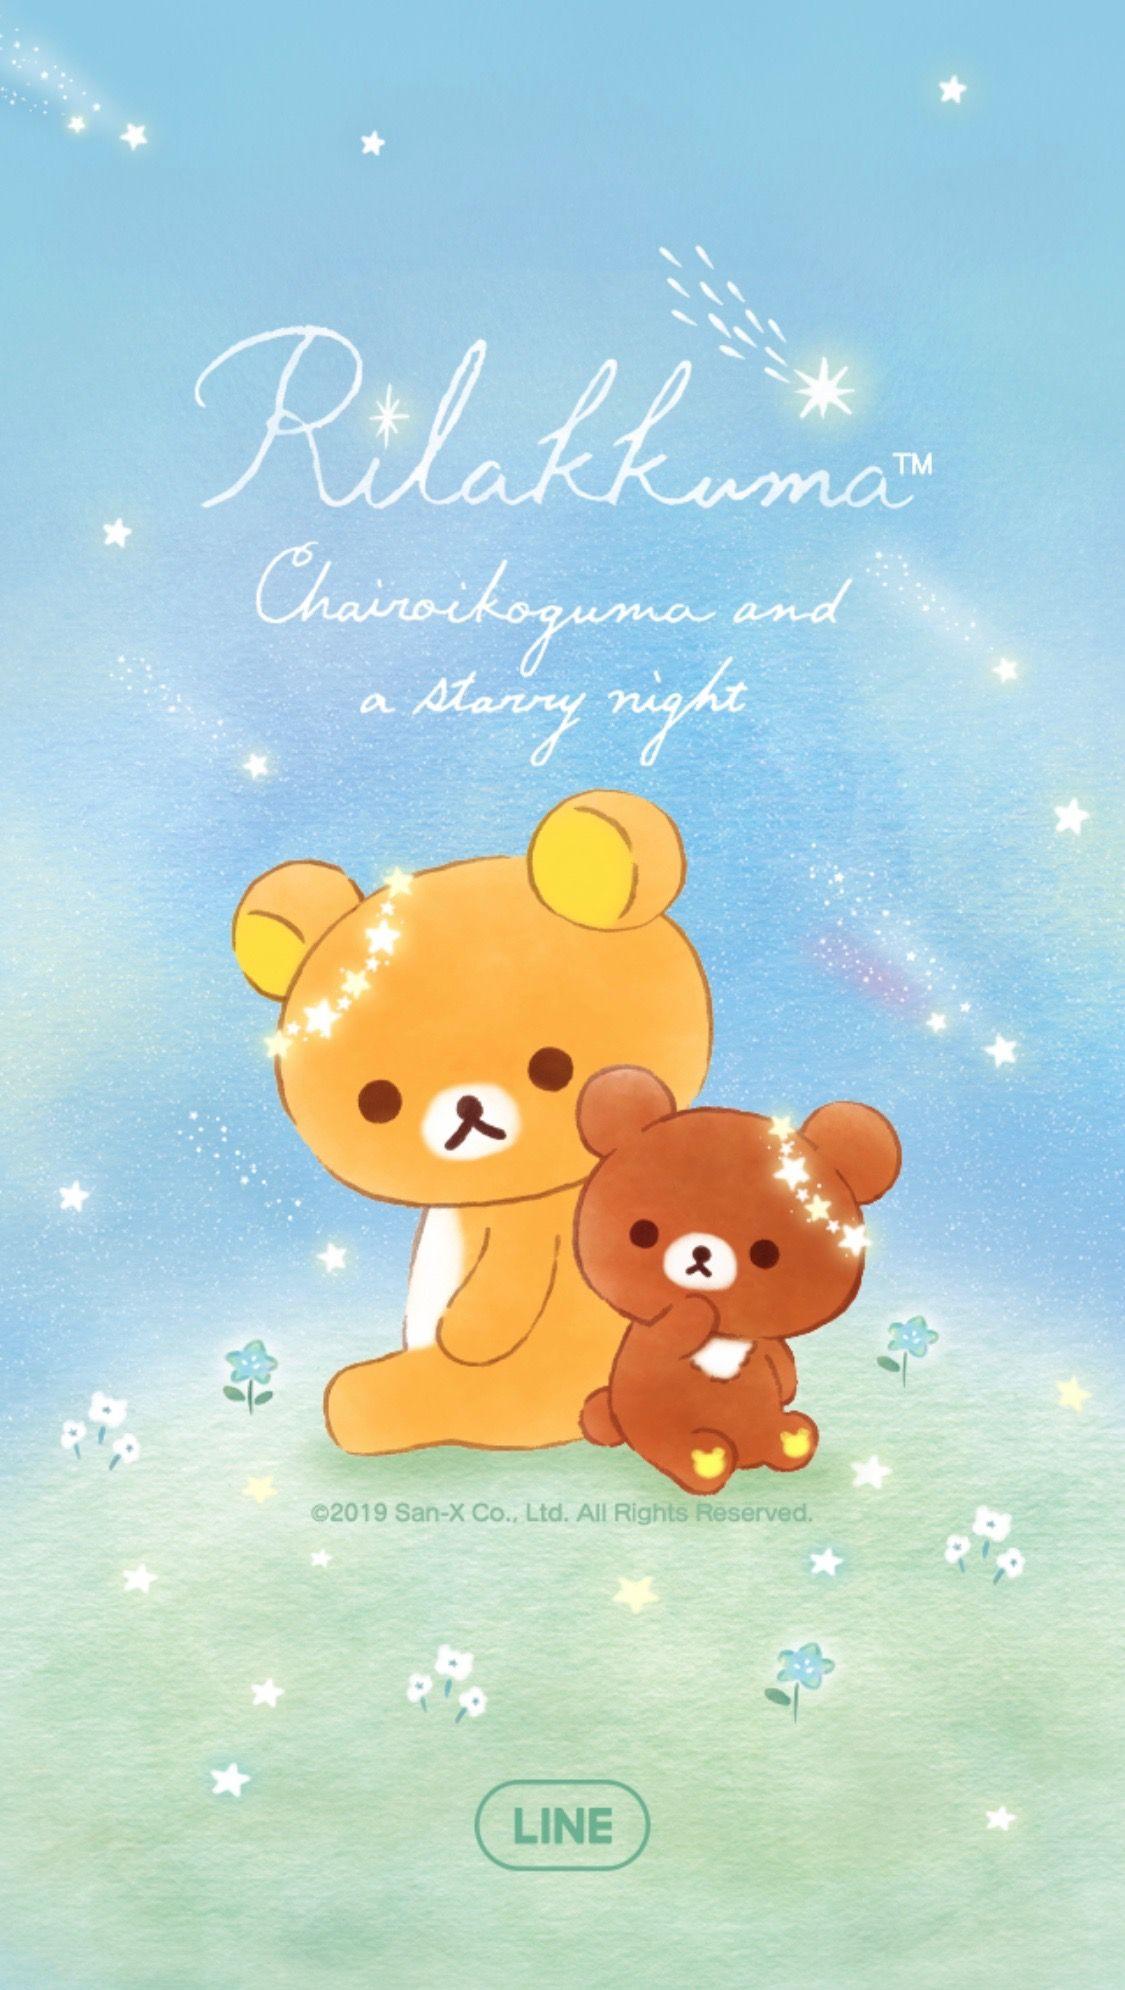 Chairoikoguma and a starry night Rilakkuma wallpaper